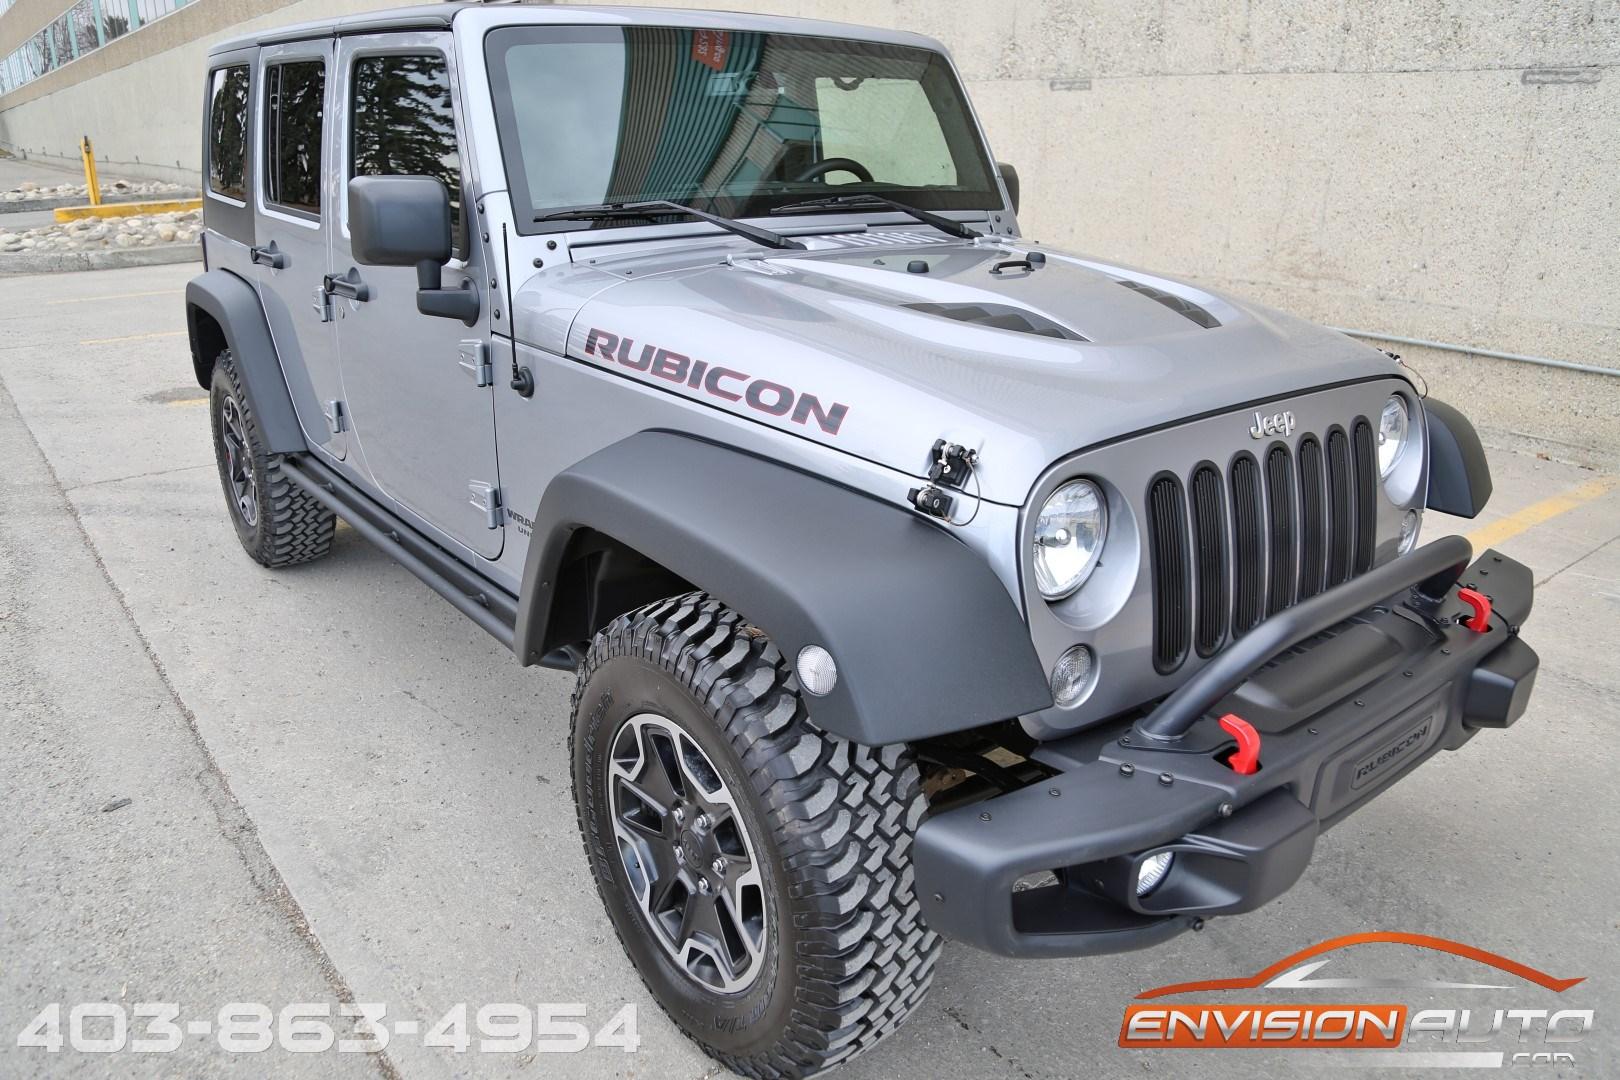 2015 jeep wrangler unlimited rubicon 4 4 hard rock edition envision auto. Black Bedroom Furniture Sets. Home Design Ideas